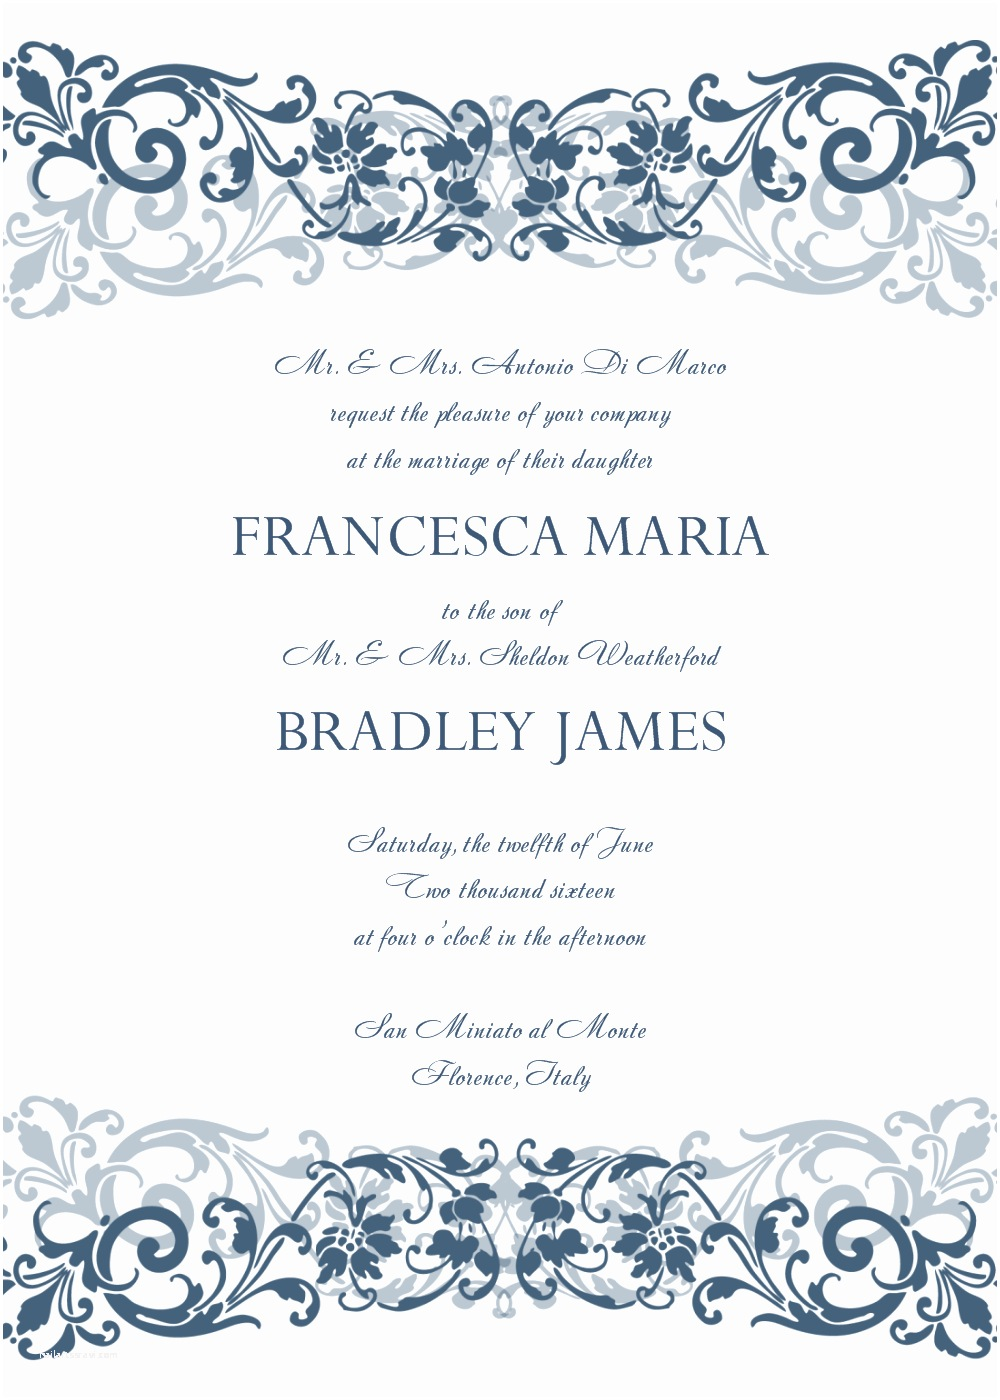 Wedding Invitation Templates Online Free Wedding Design Invitation Template